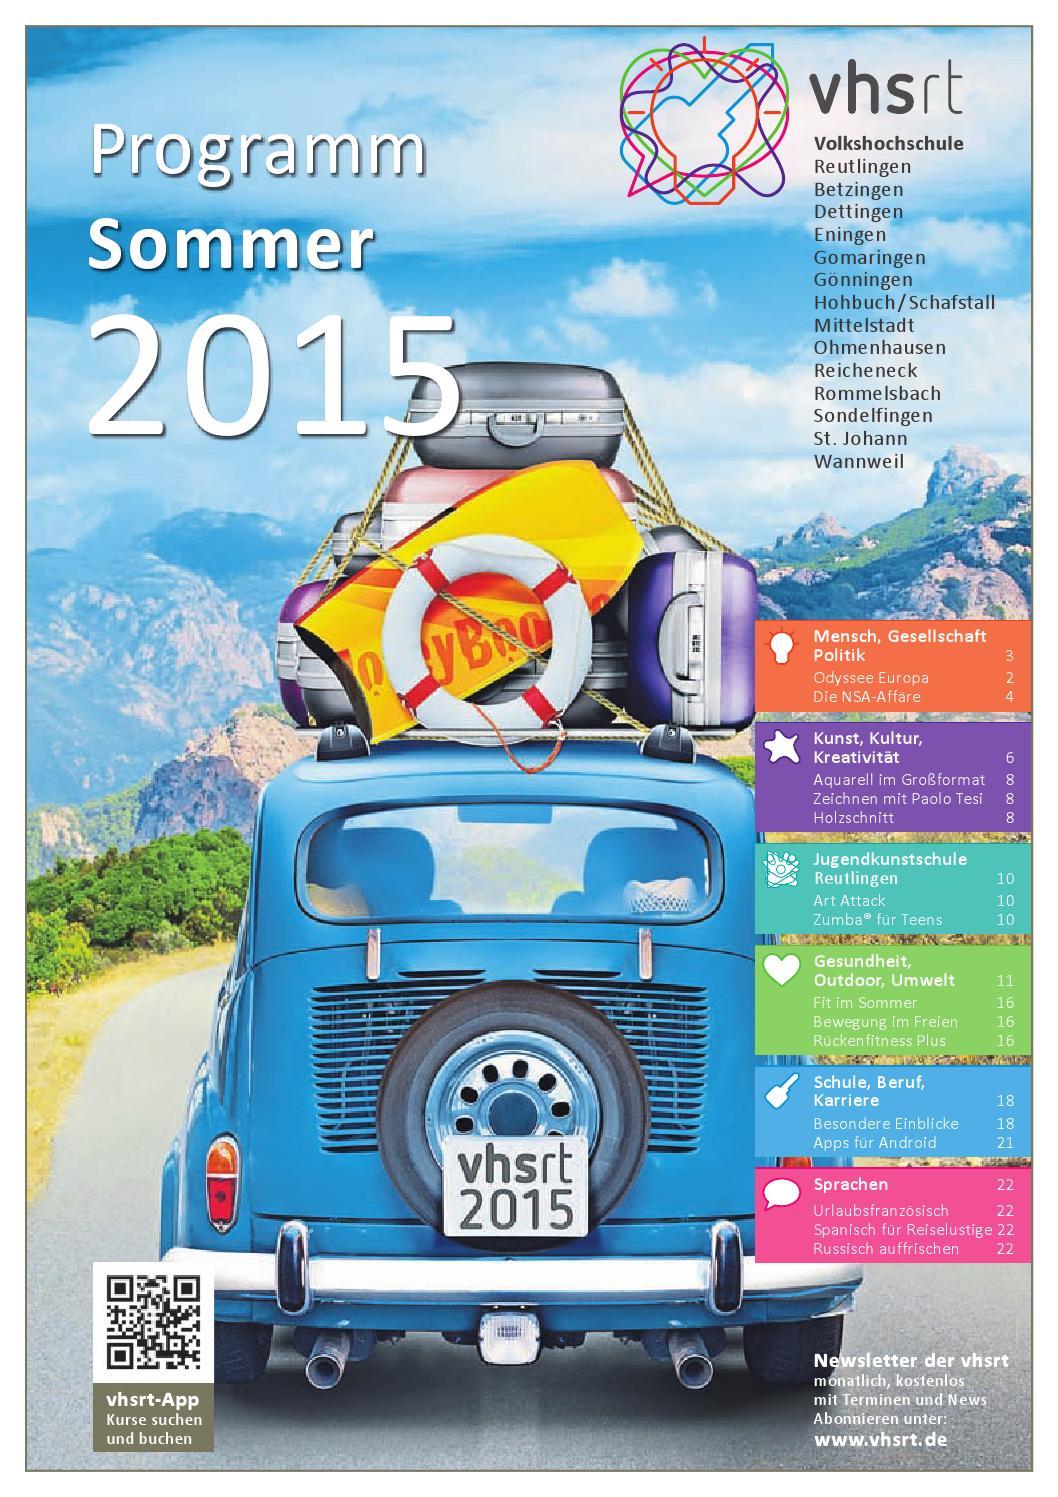 Volkshochschule Reutlingen Programm Sommer2015 By